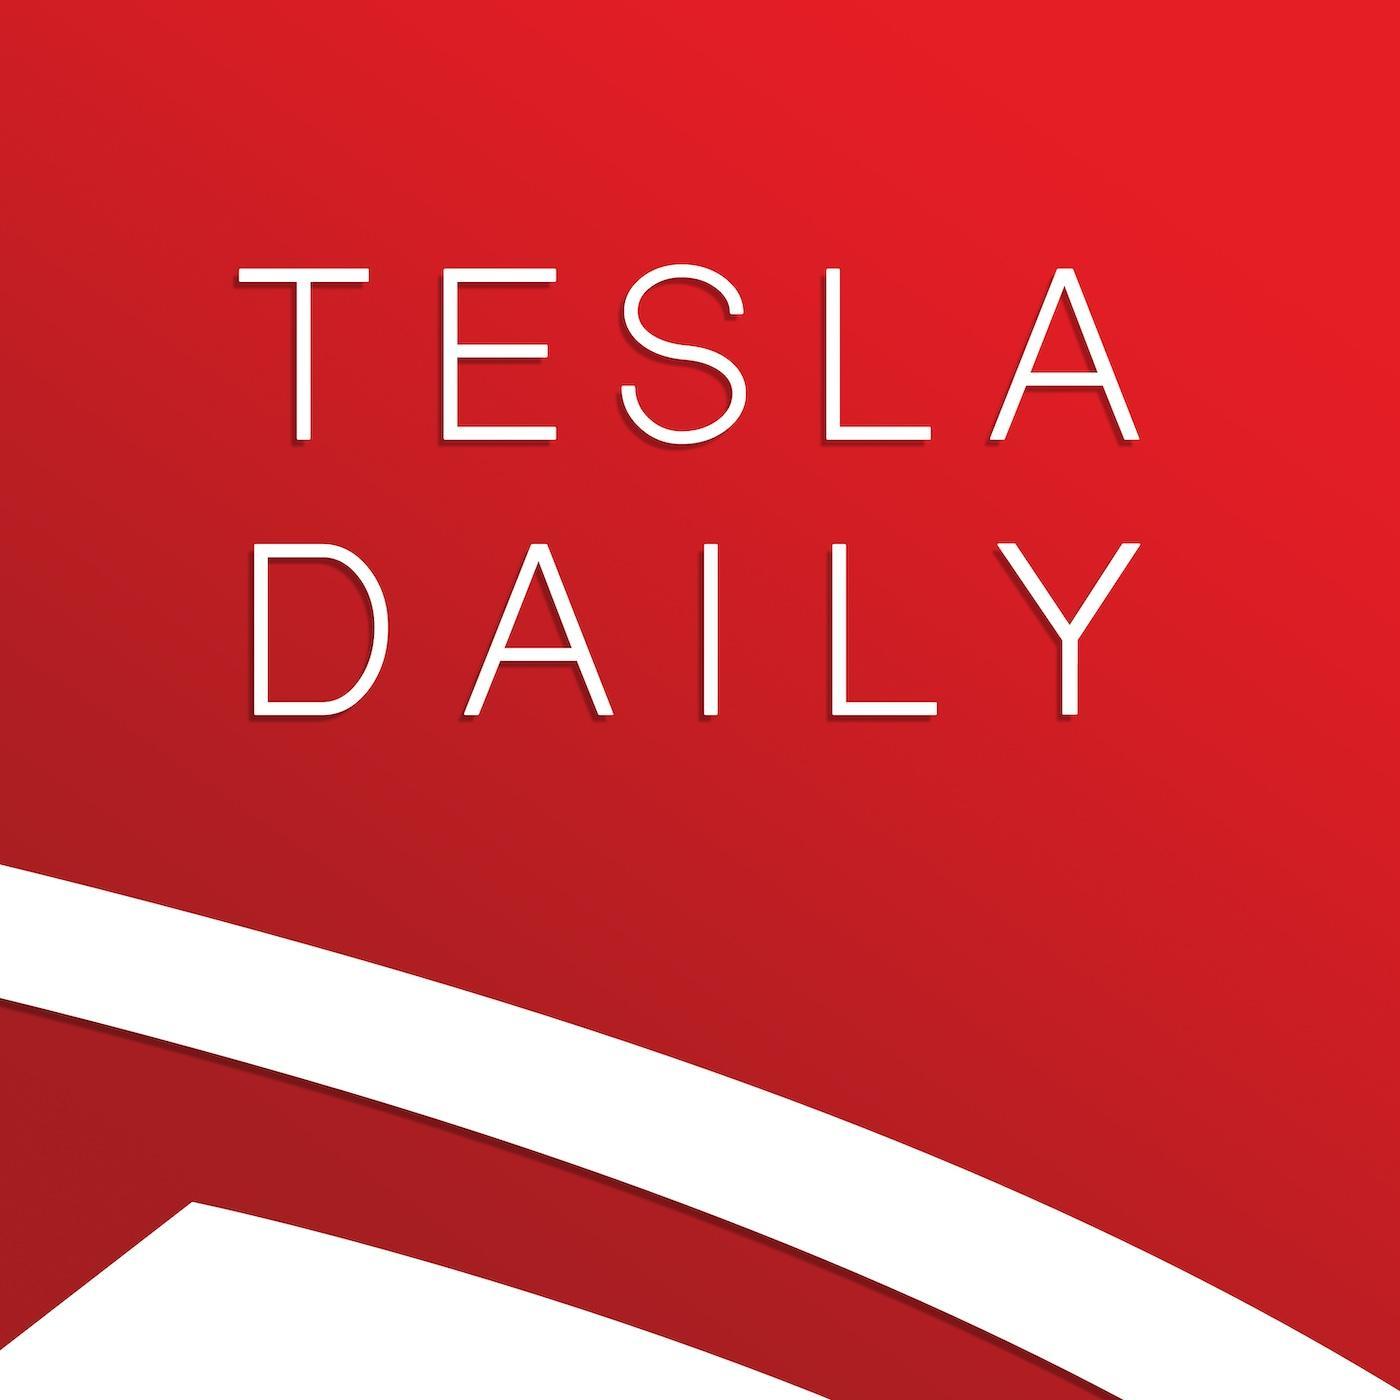 Media Surprised by Tesla Registrations Despite Shutdown (06.17.20)